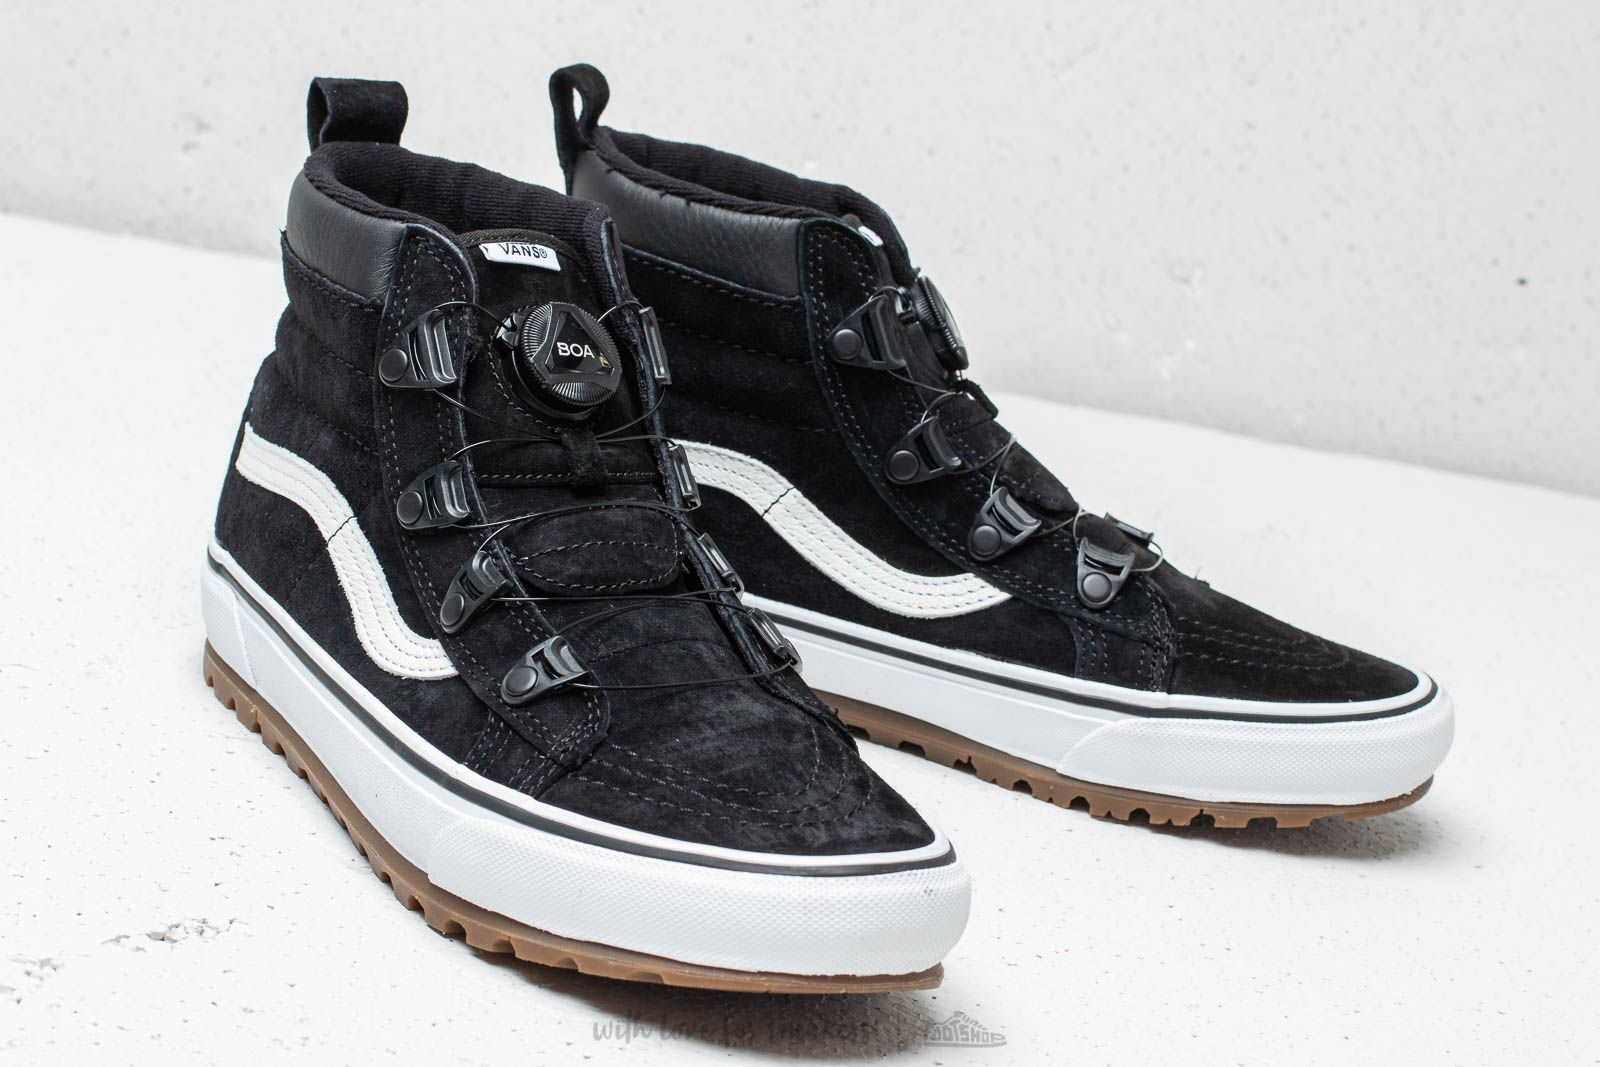 Vans Sk8-Hi BOA (MTE) Black/ True White | Footshop